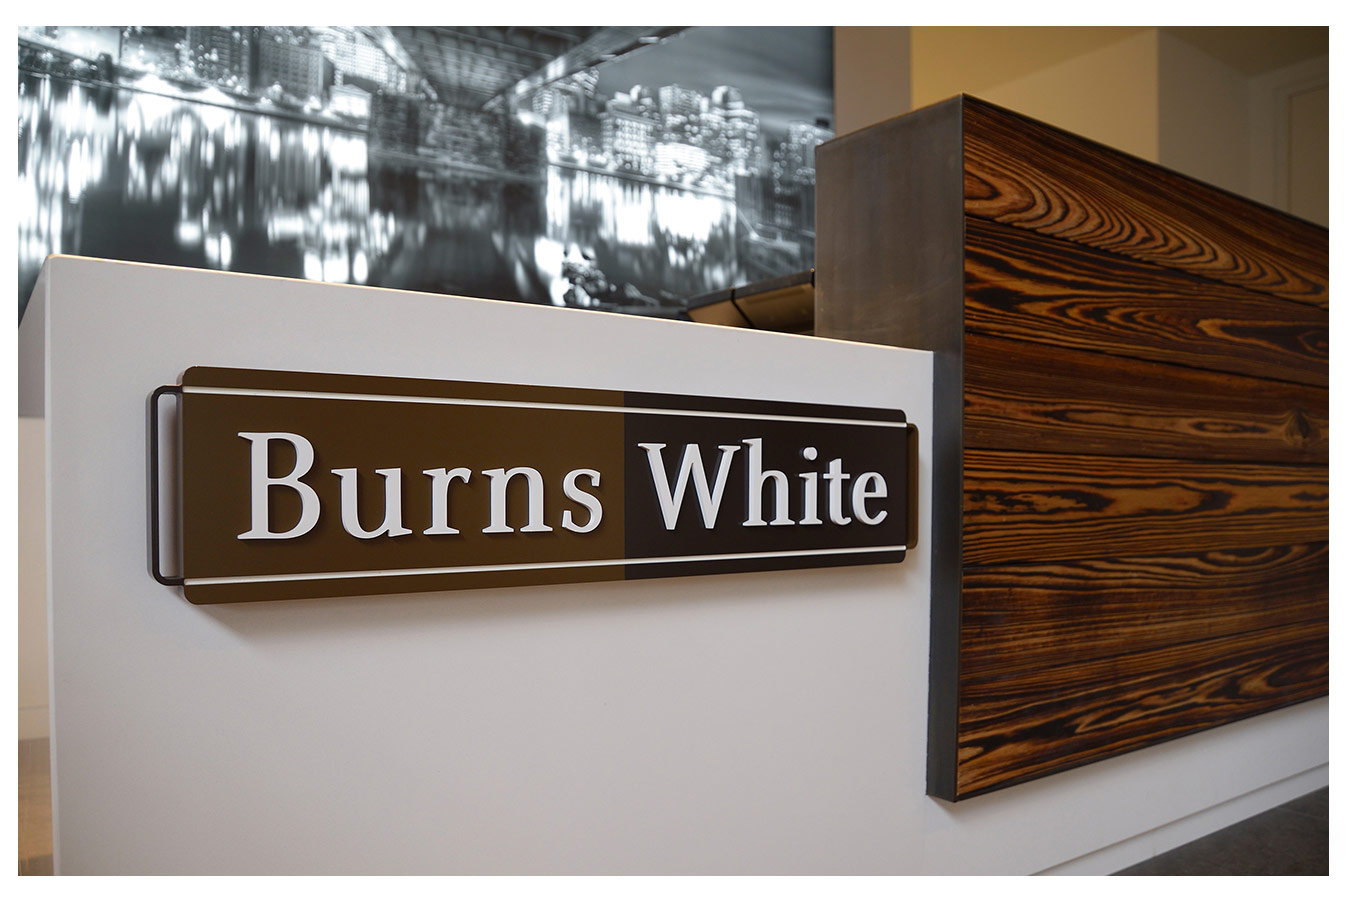 Burns White - Logo at Reception Desk